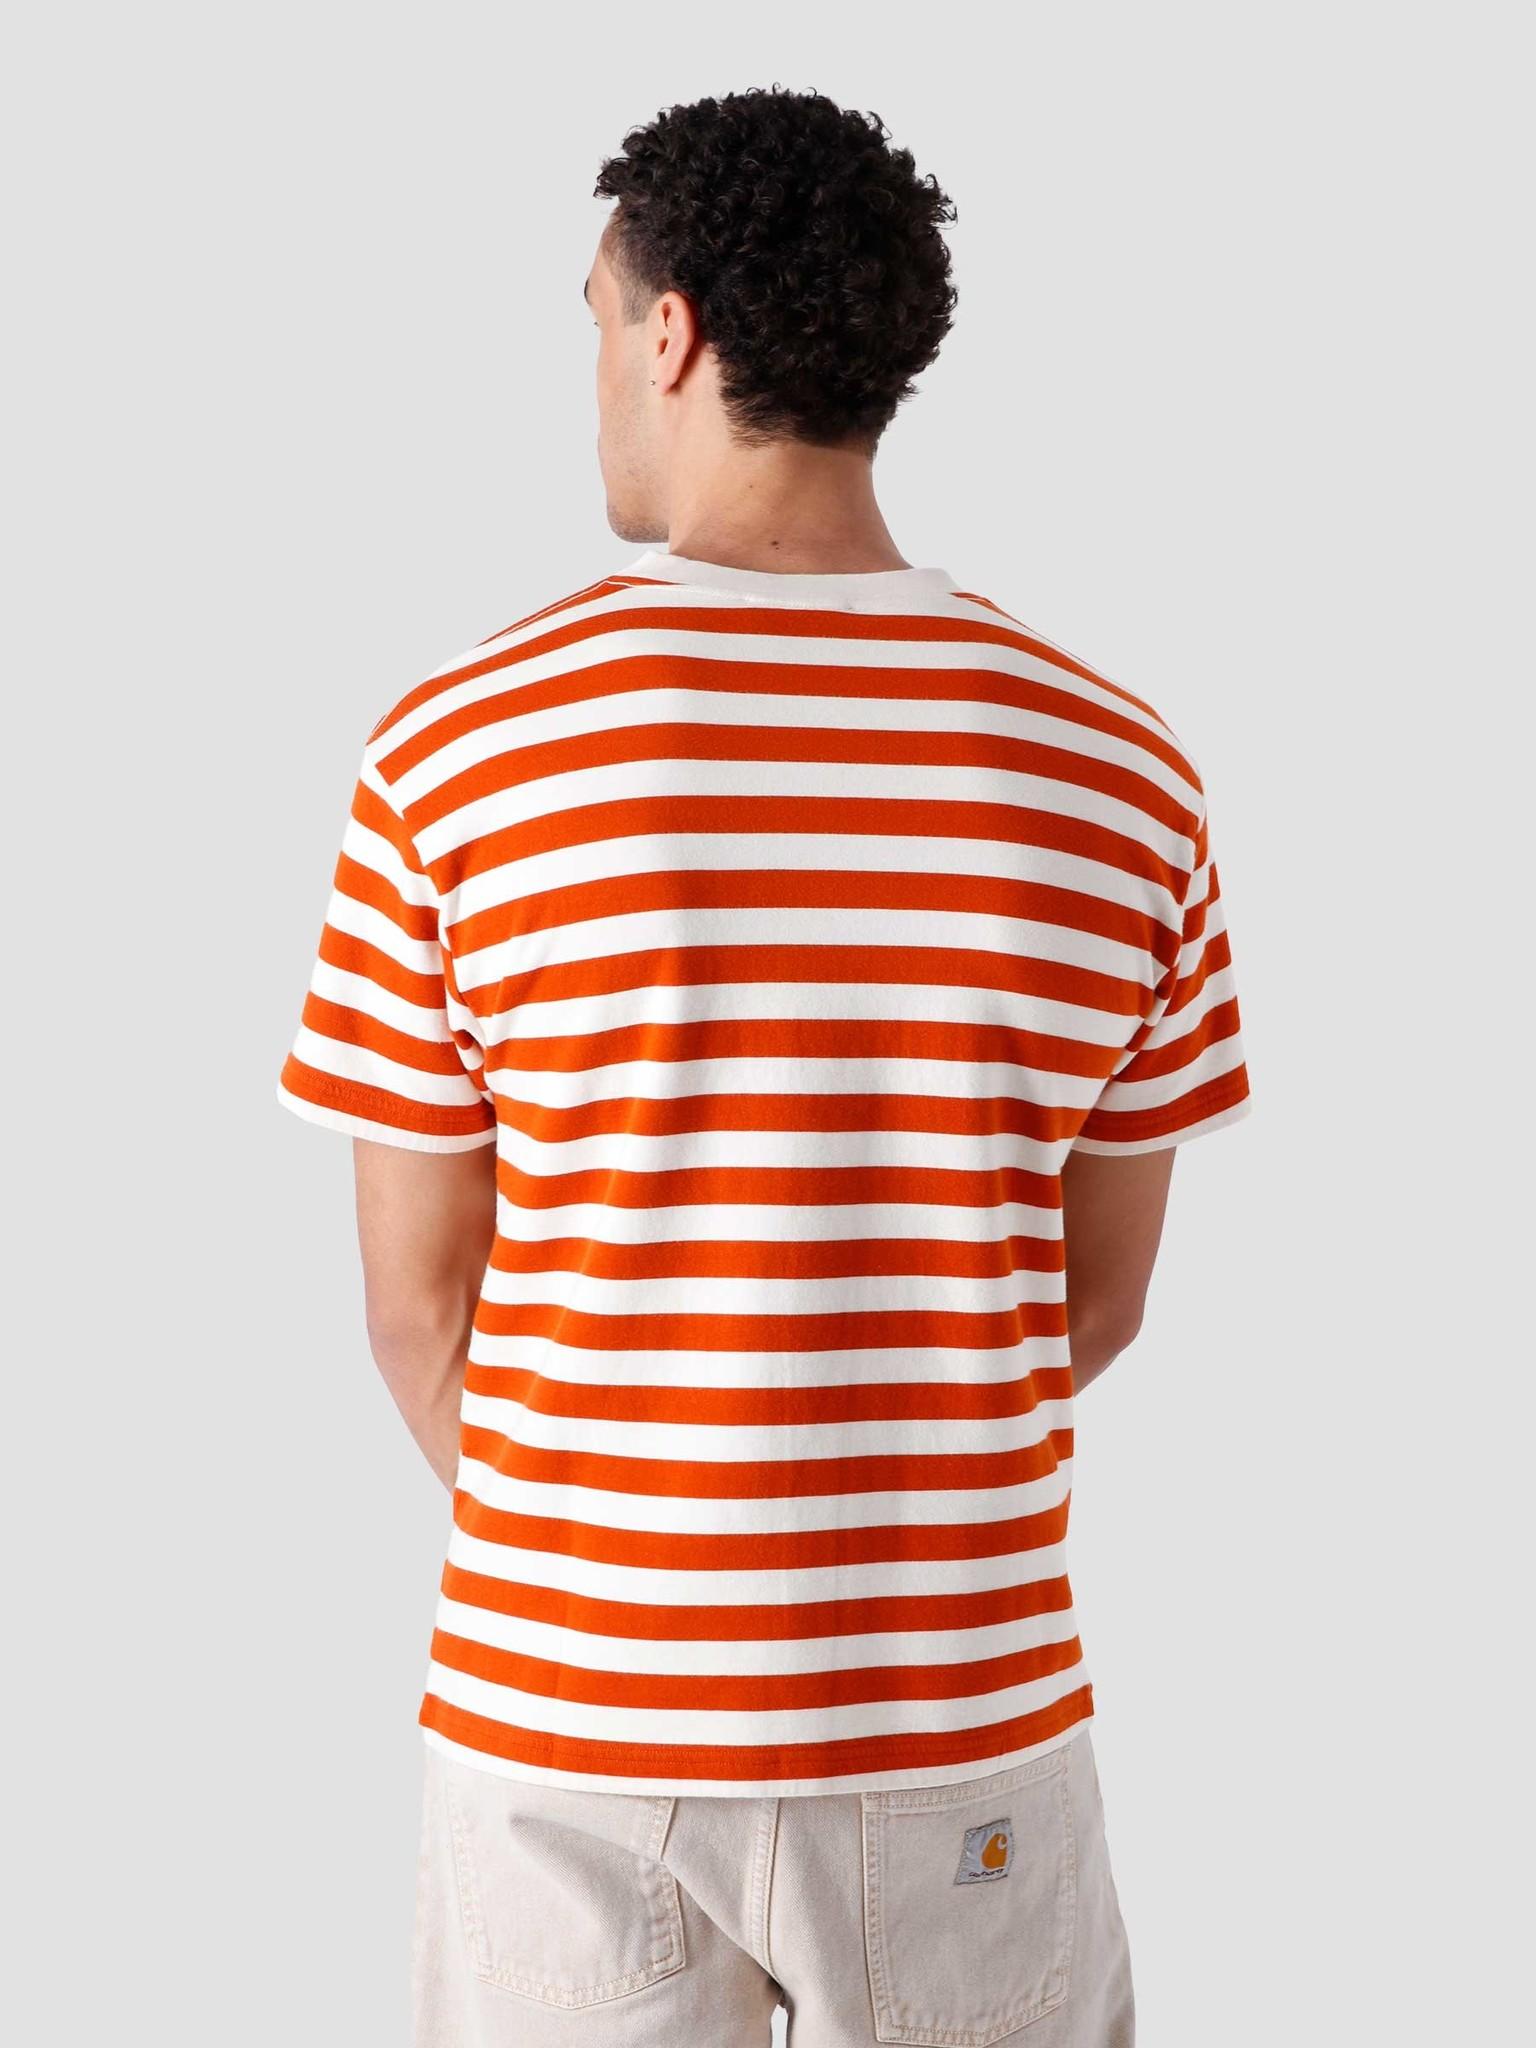 Olaf Hussein Olaf Hussein Stripe Sans T-Shirt White Orange